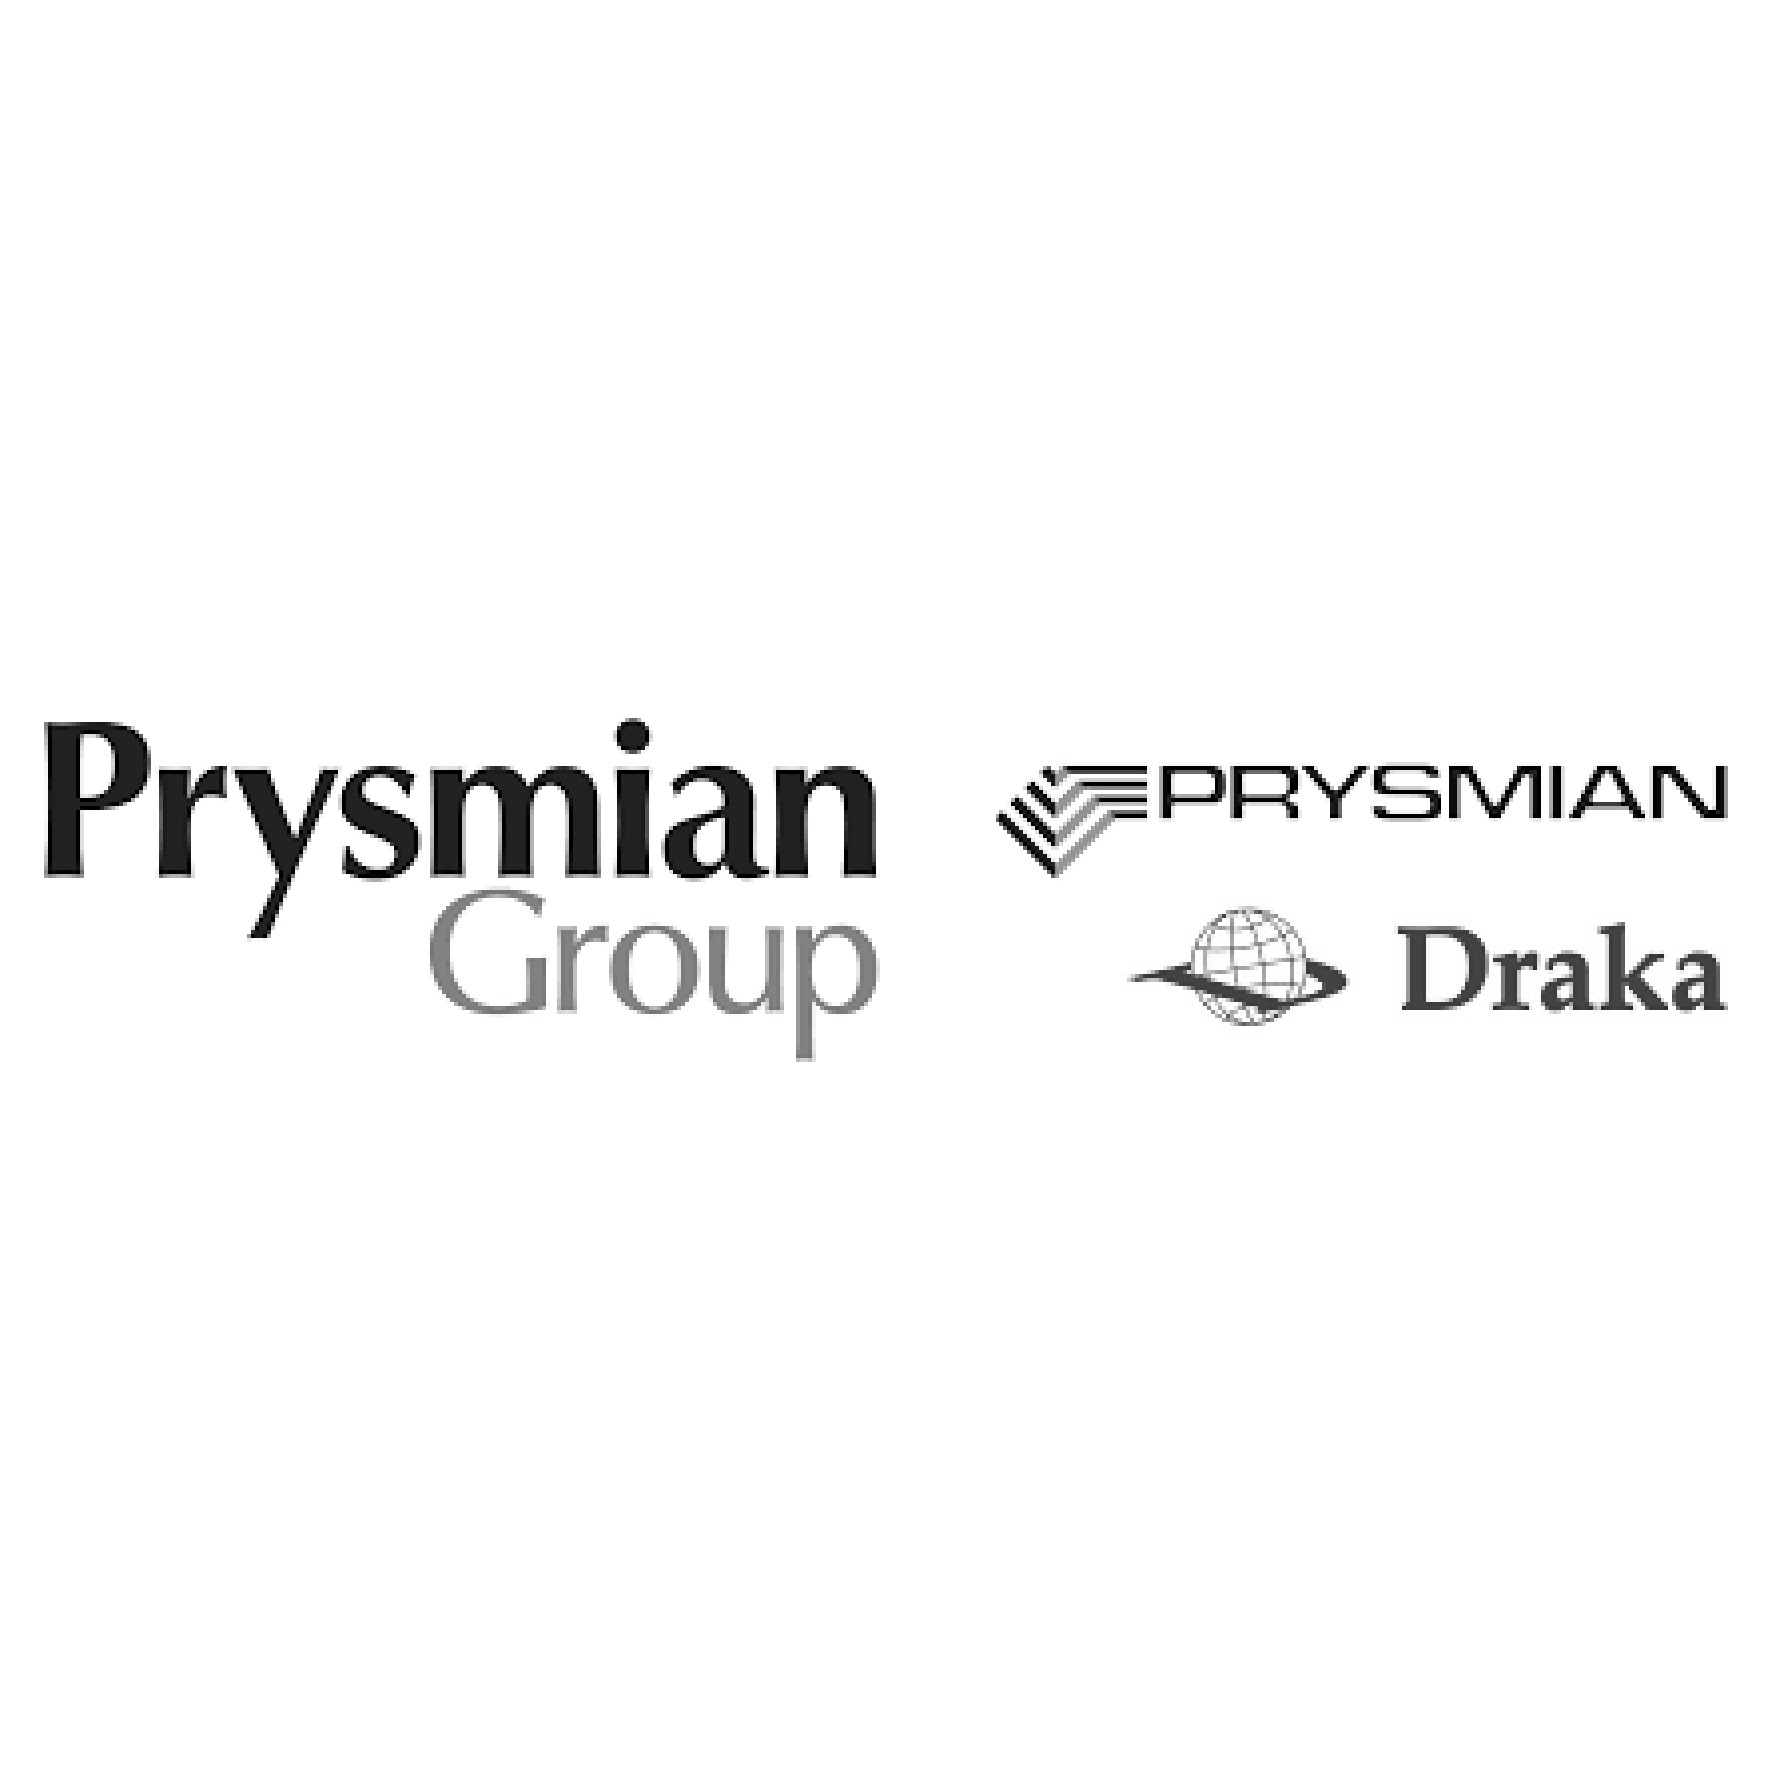 draka_prysmian-group